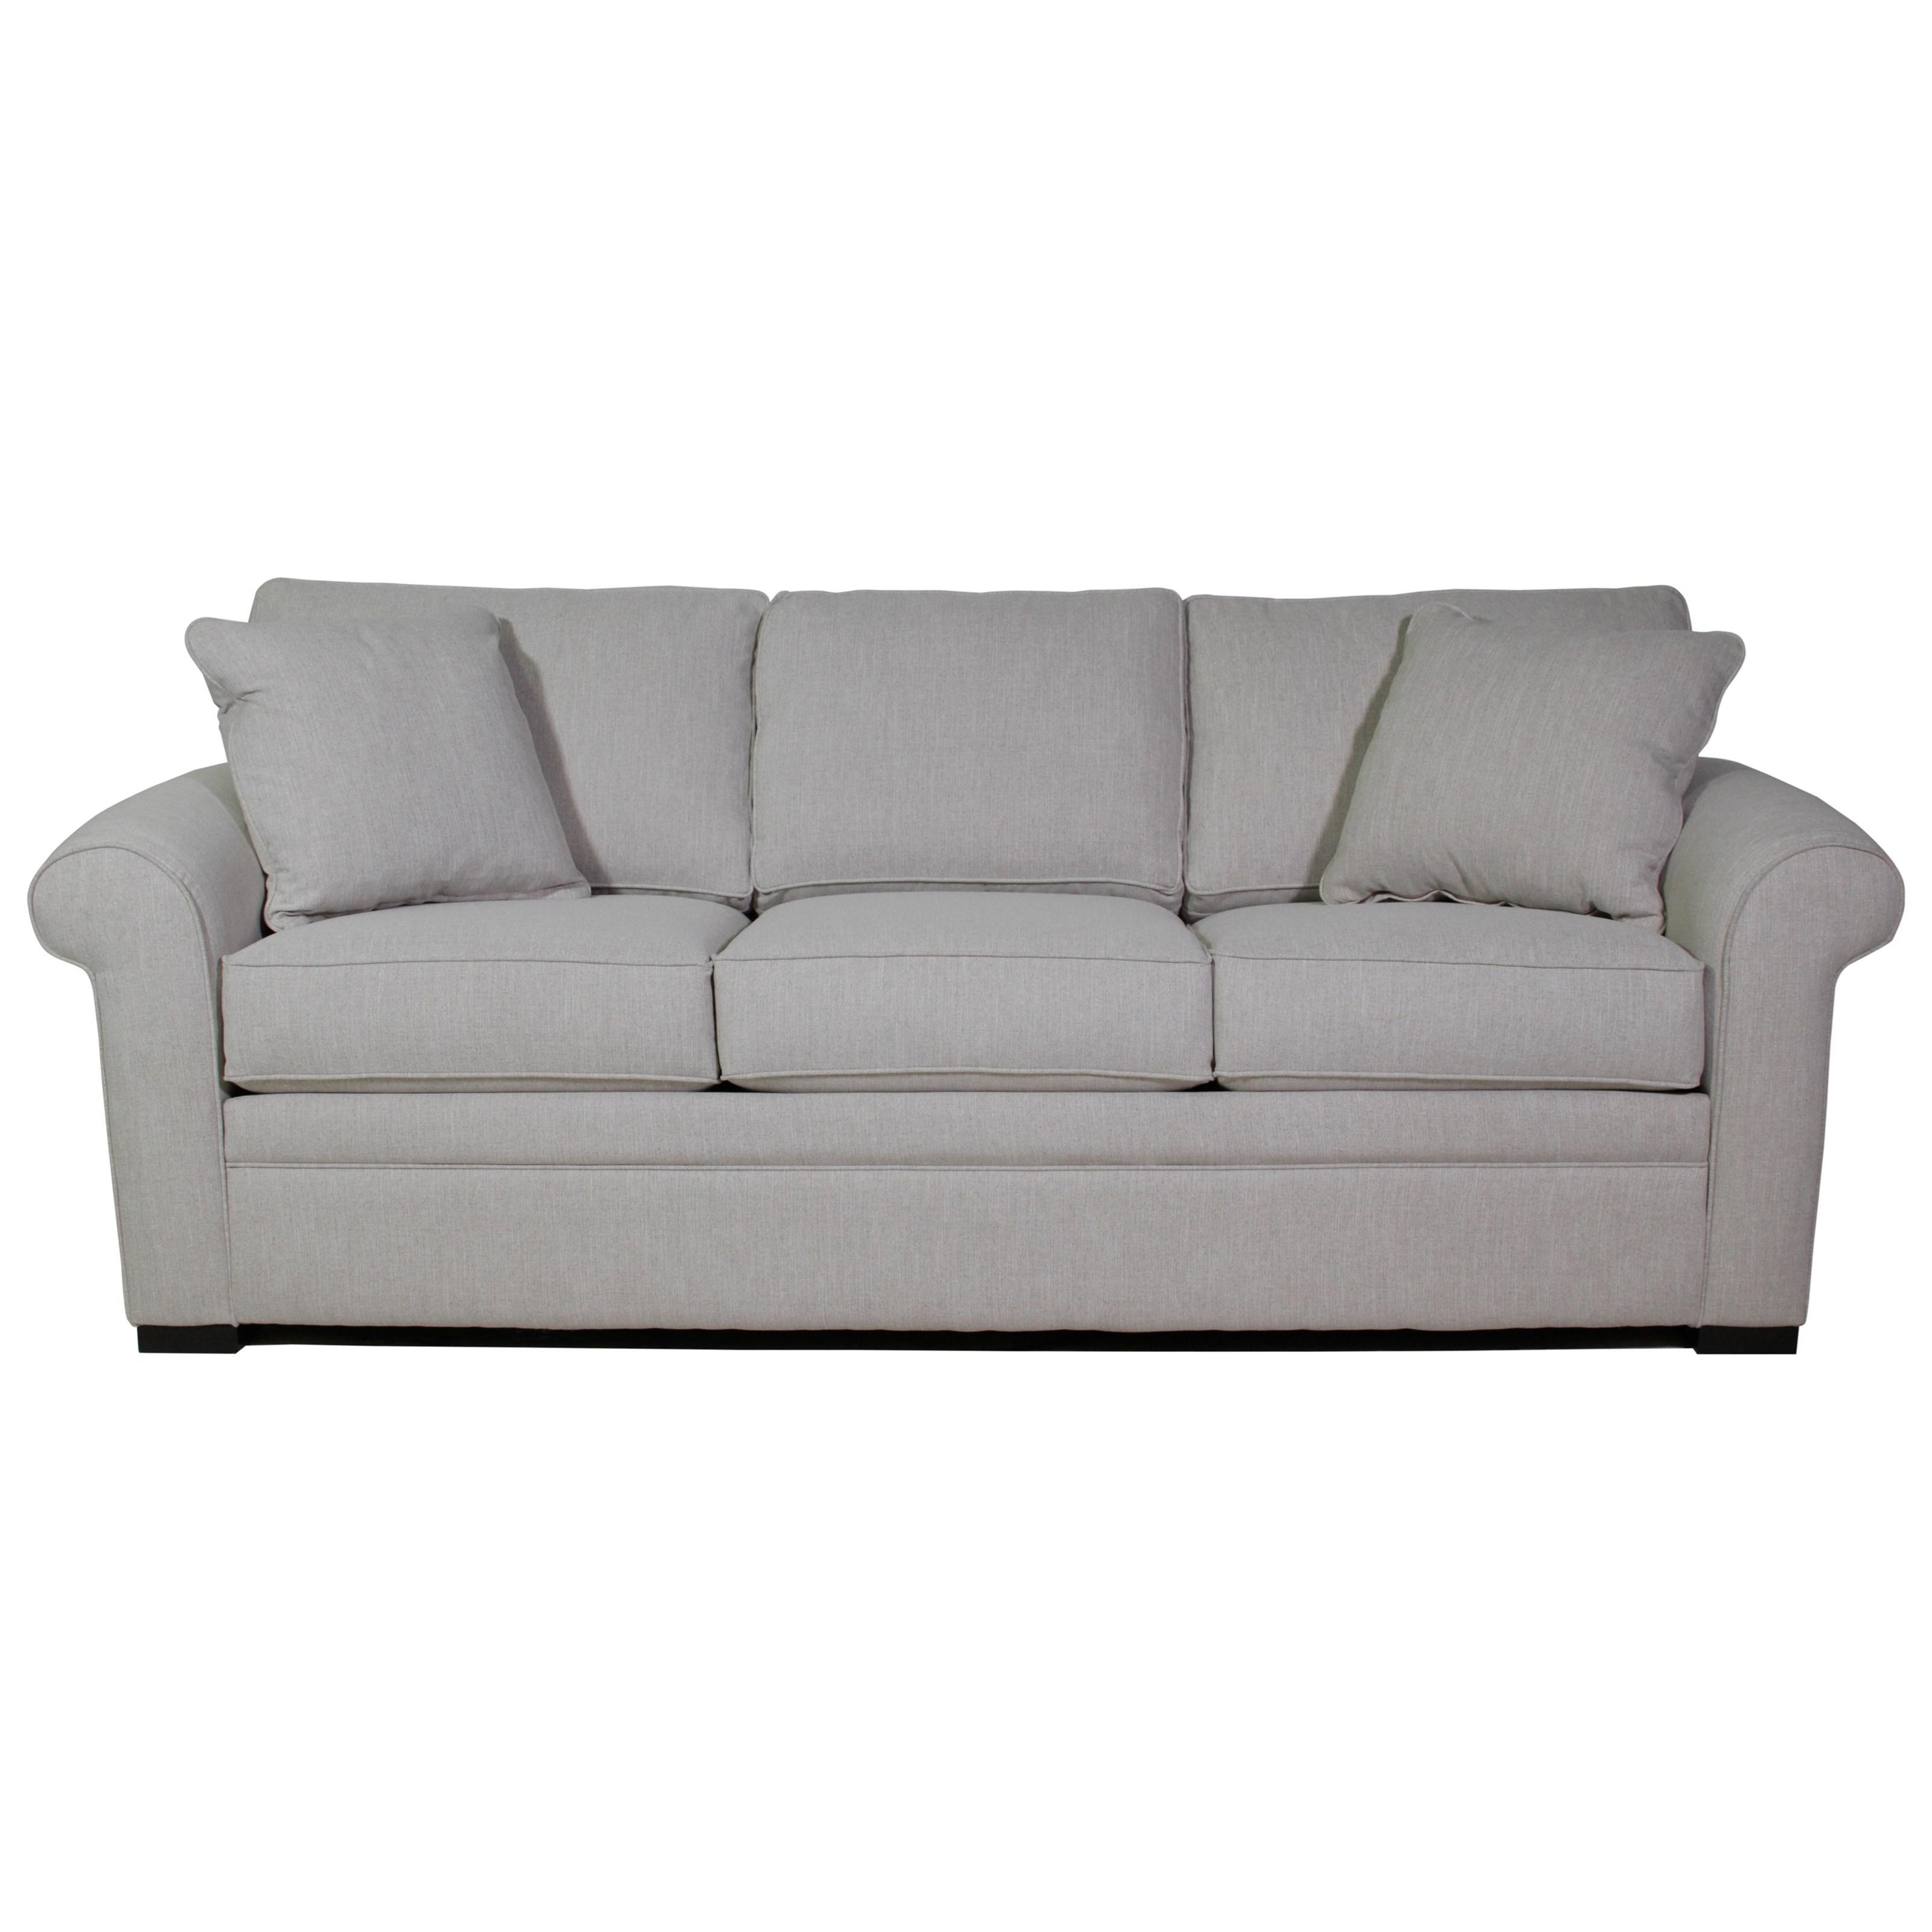 Jonathan Louis DozyQueen Inflatable Mattress Sofa Sleeper ...